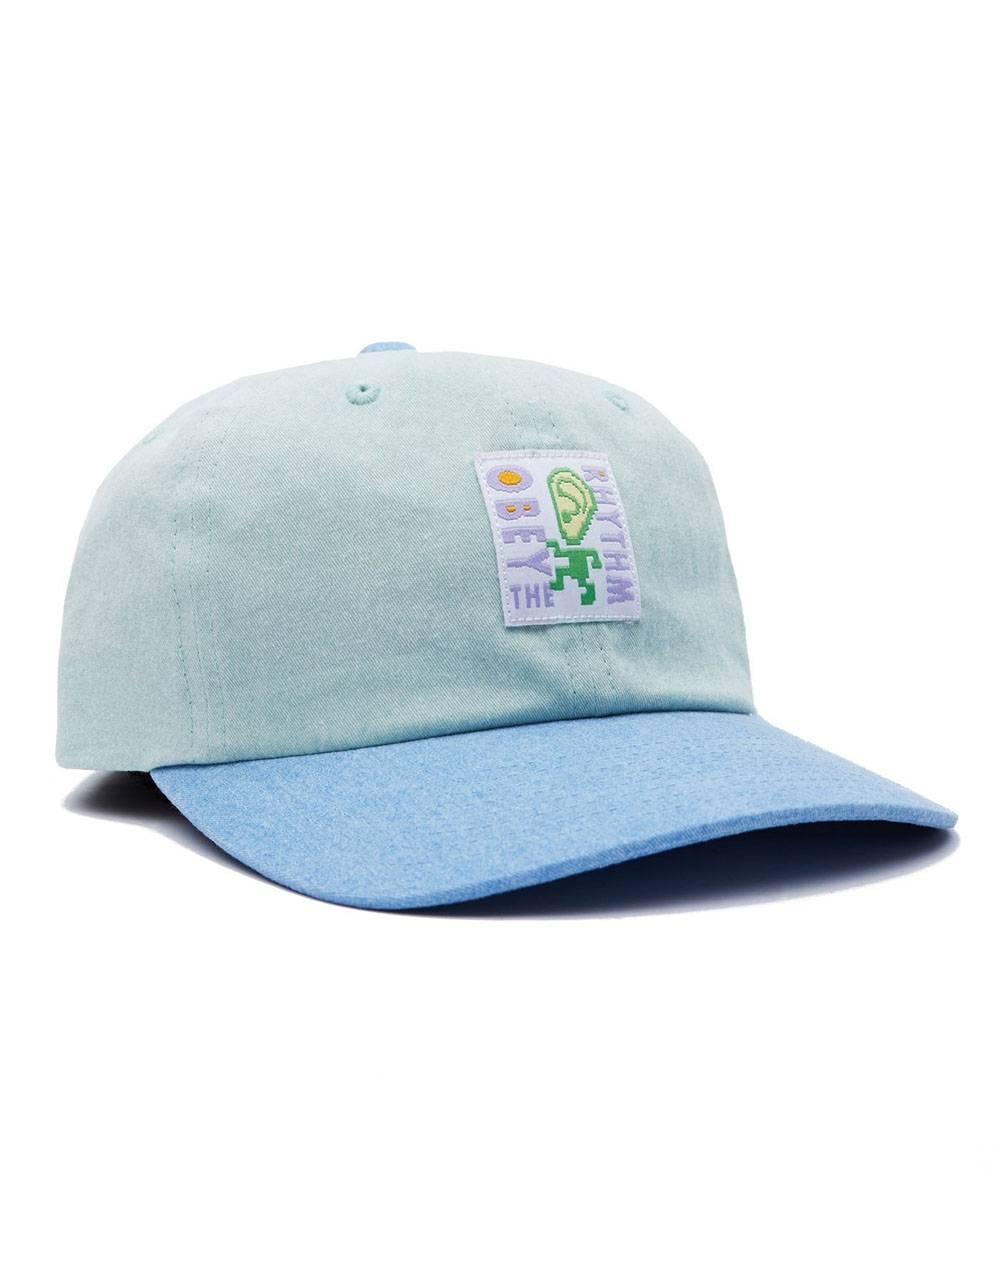 Obey Rhythm 6 panel strapback hat - mint multi obey Hat 36,89€